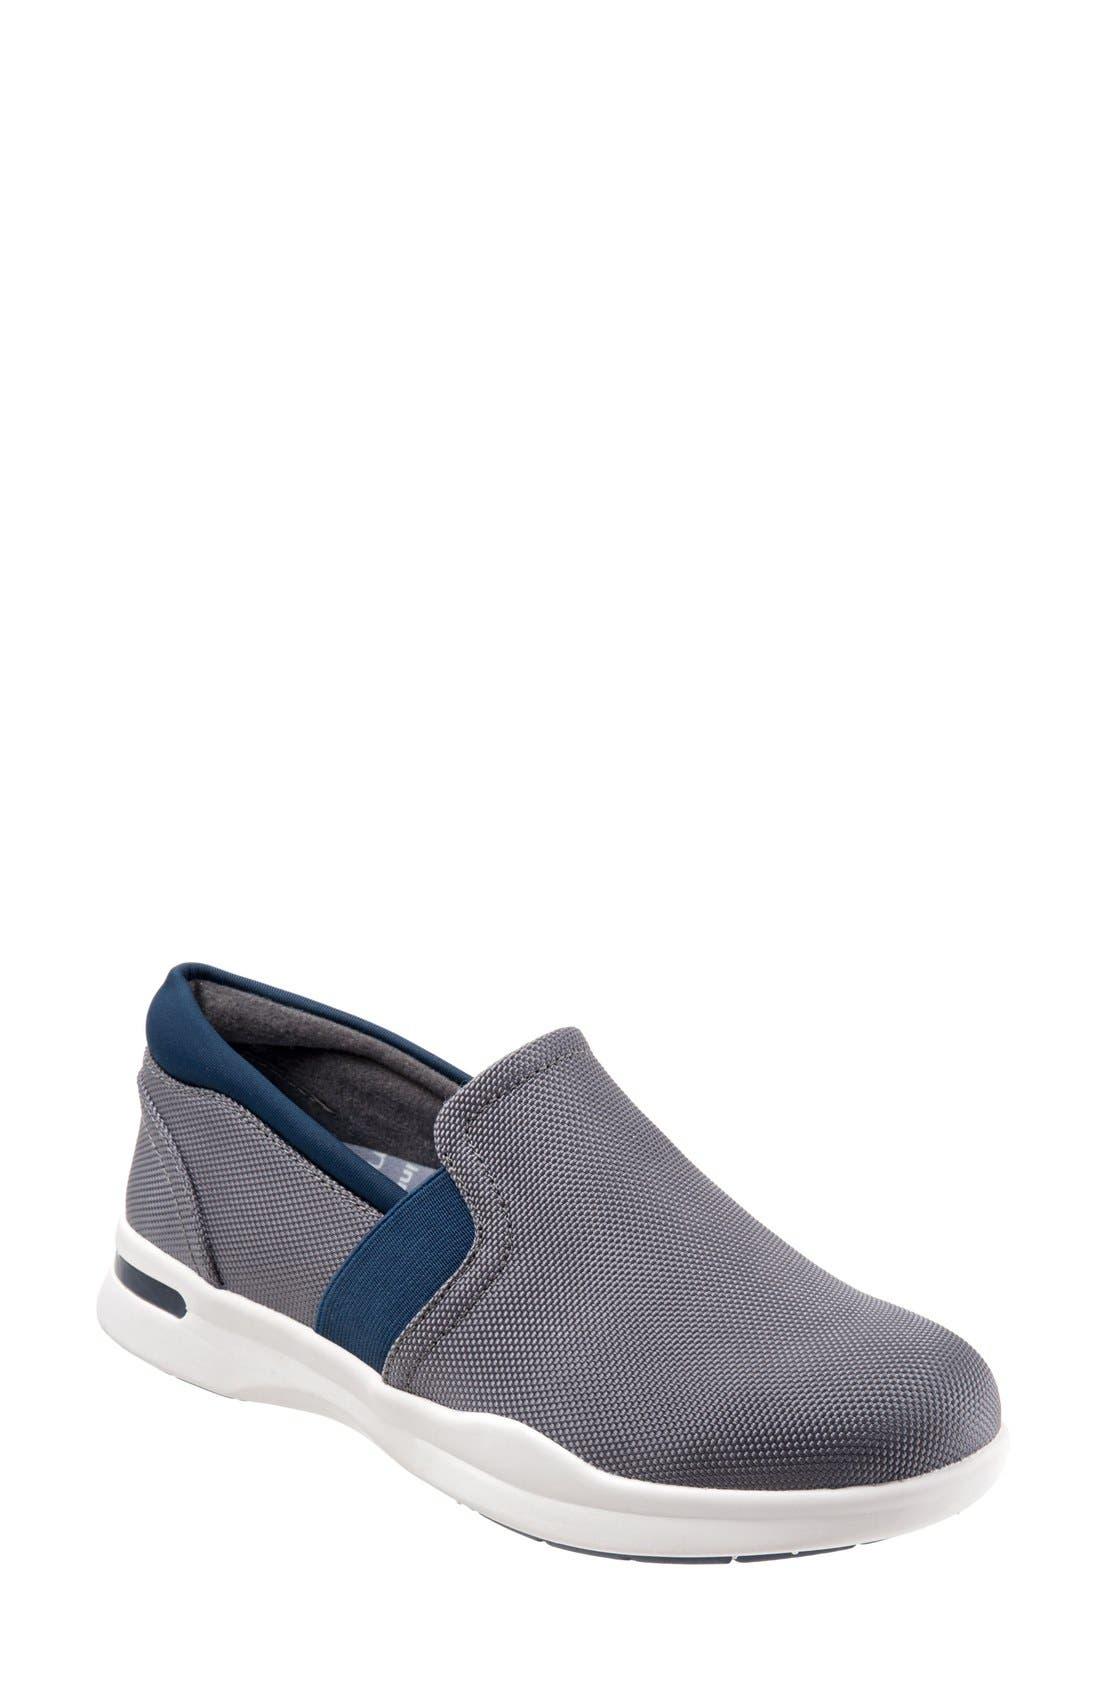 'Vantage' Slip-On Sneaker,                             Main thumbnail 1, color,                             Grey-Navy